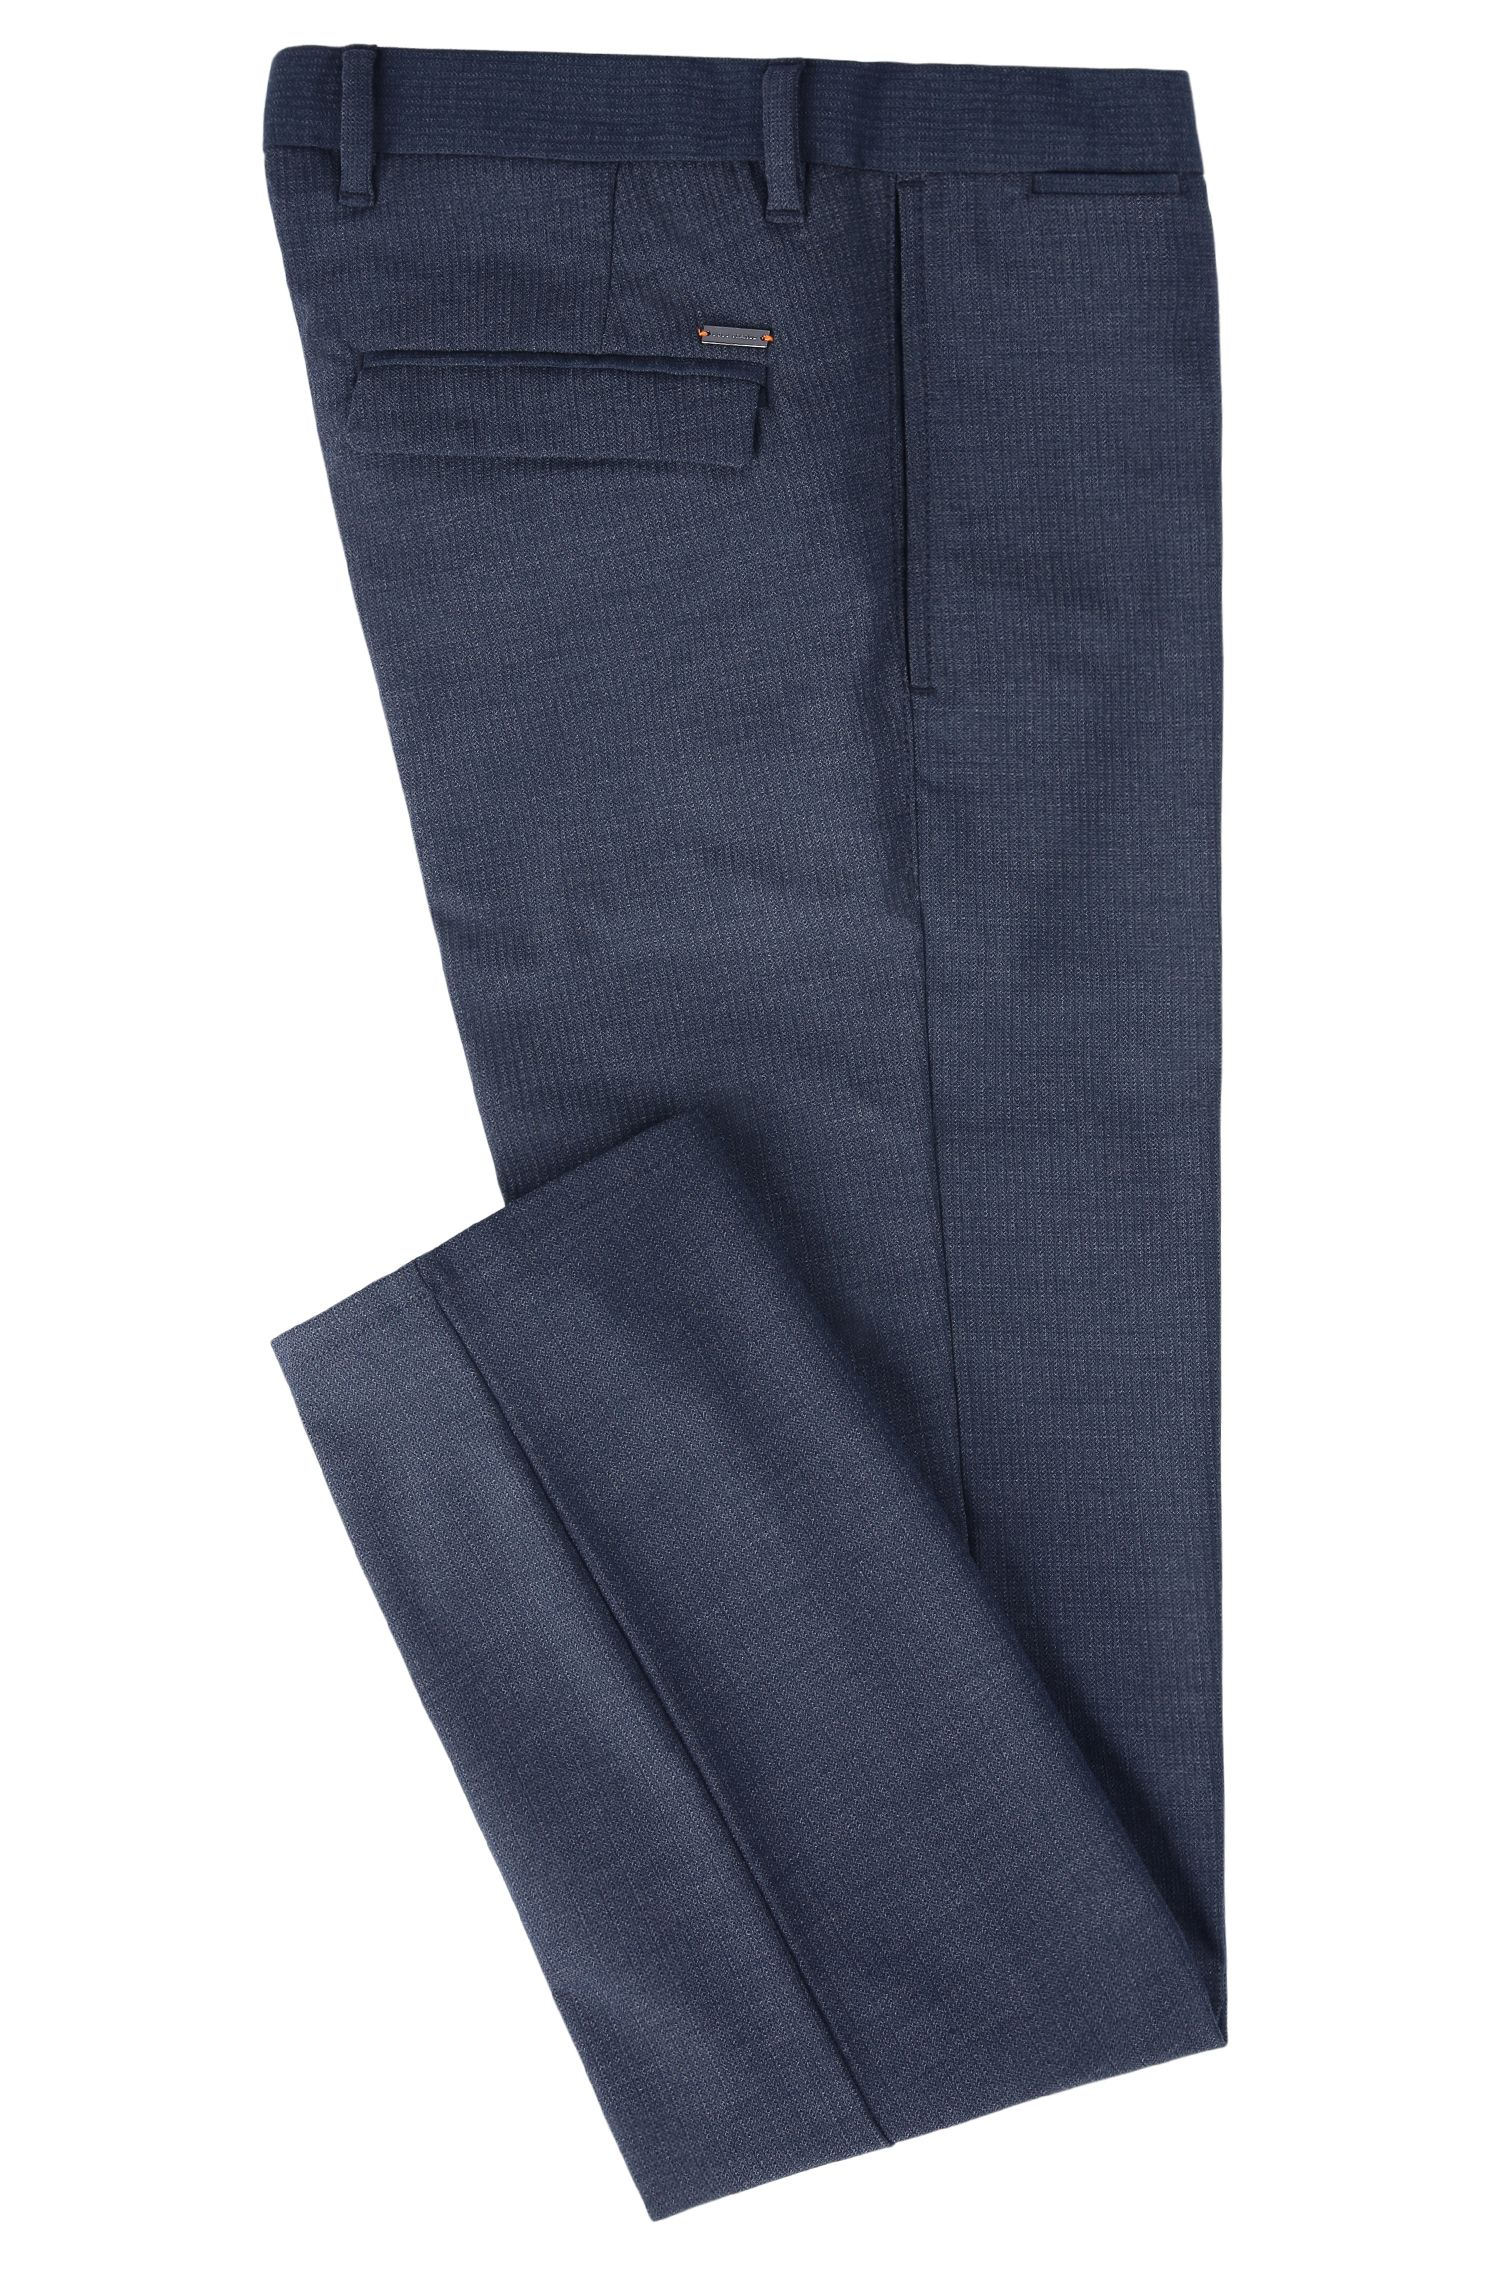 Viscose Blend Pant, Slim Fit | Slim